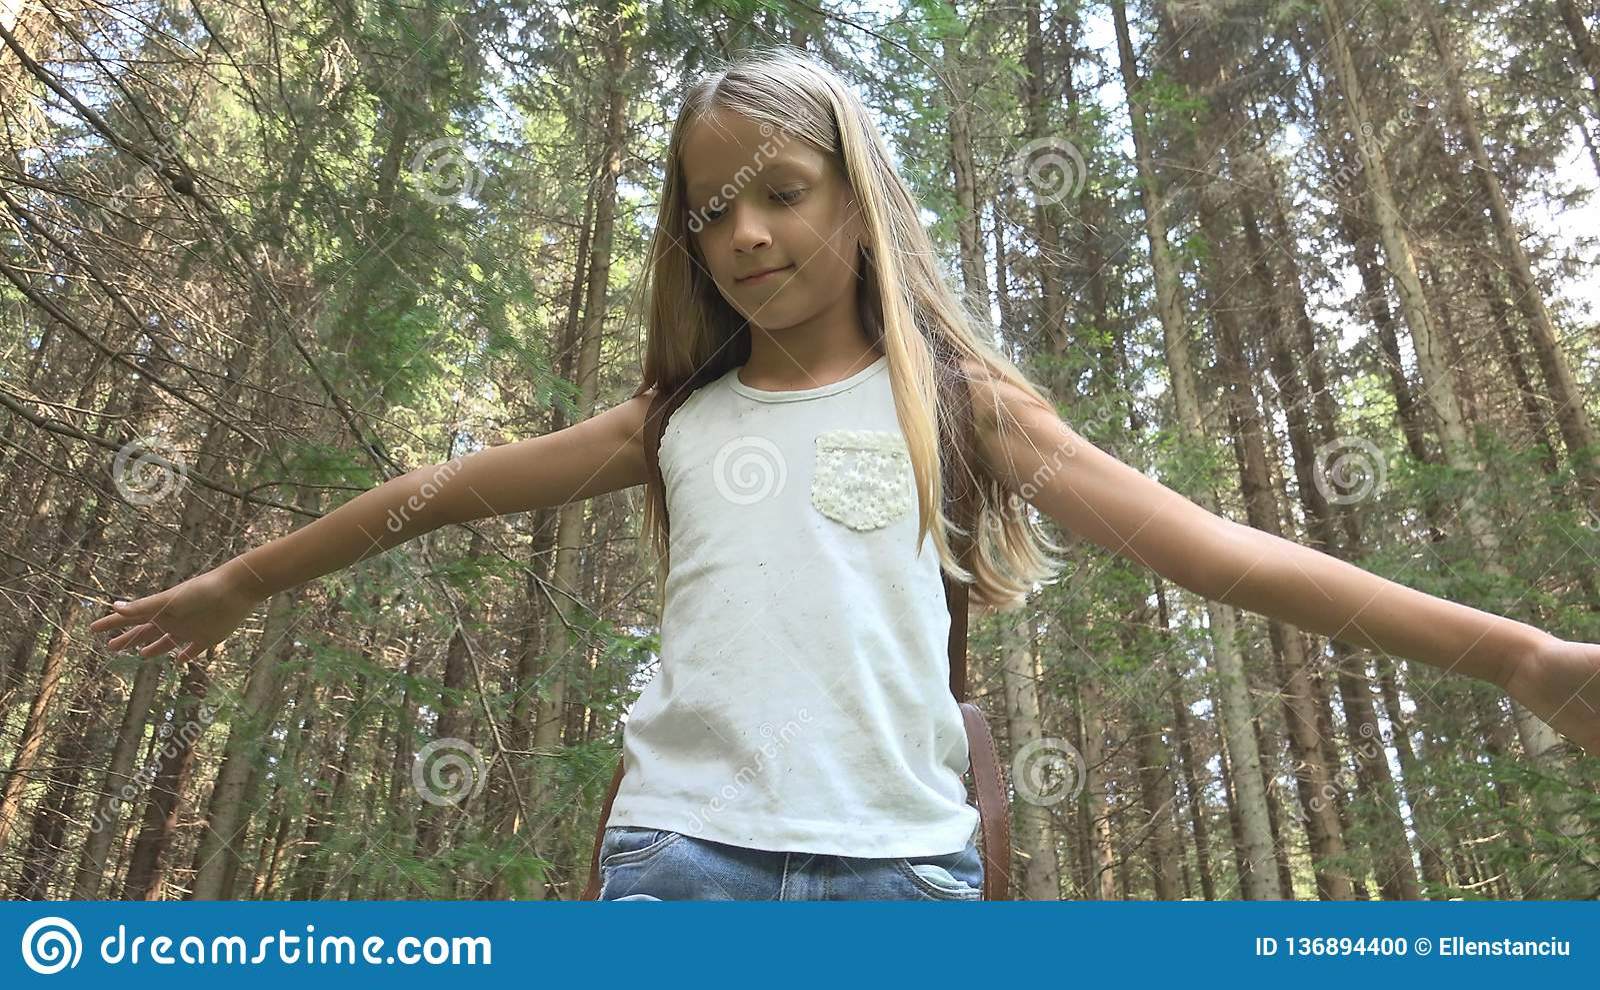 Kind in Forest Walking op Logboek, Jong geitje Speel het Kamperen Avontuur, Meisjes Openluchthout